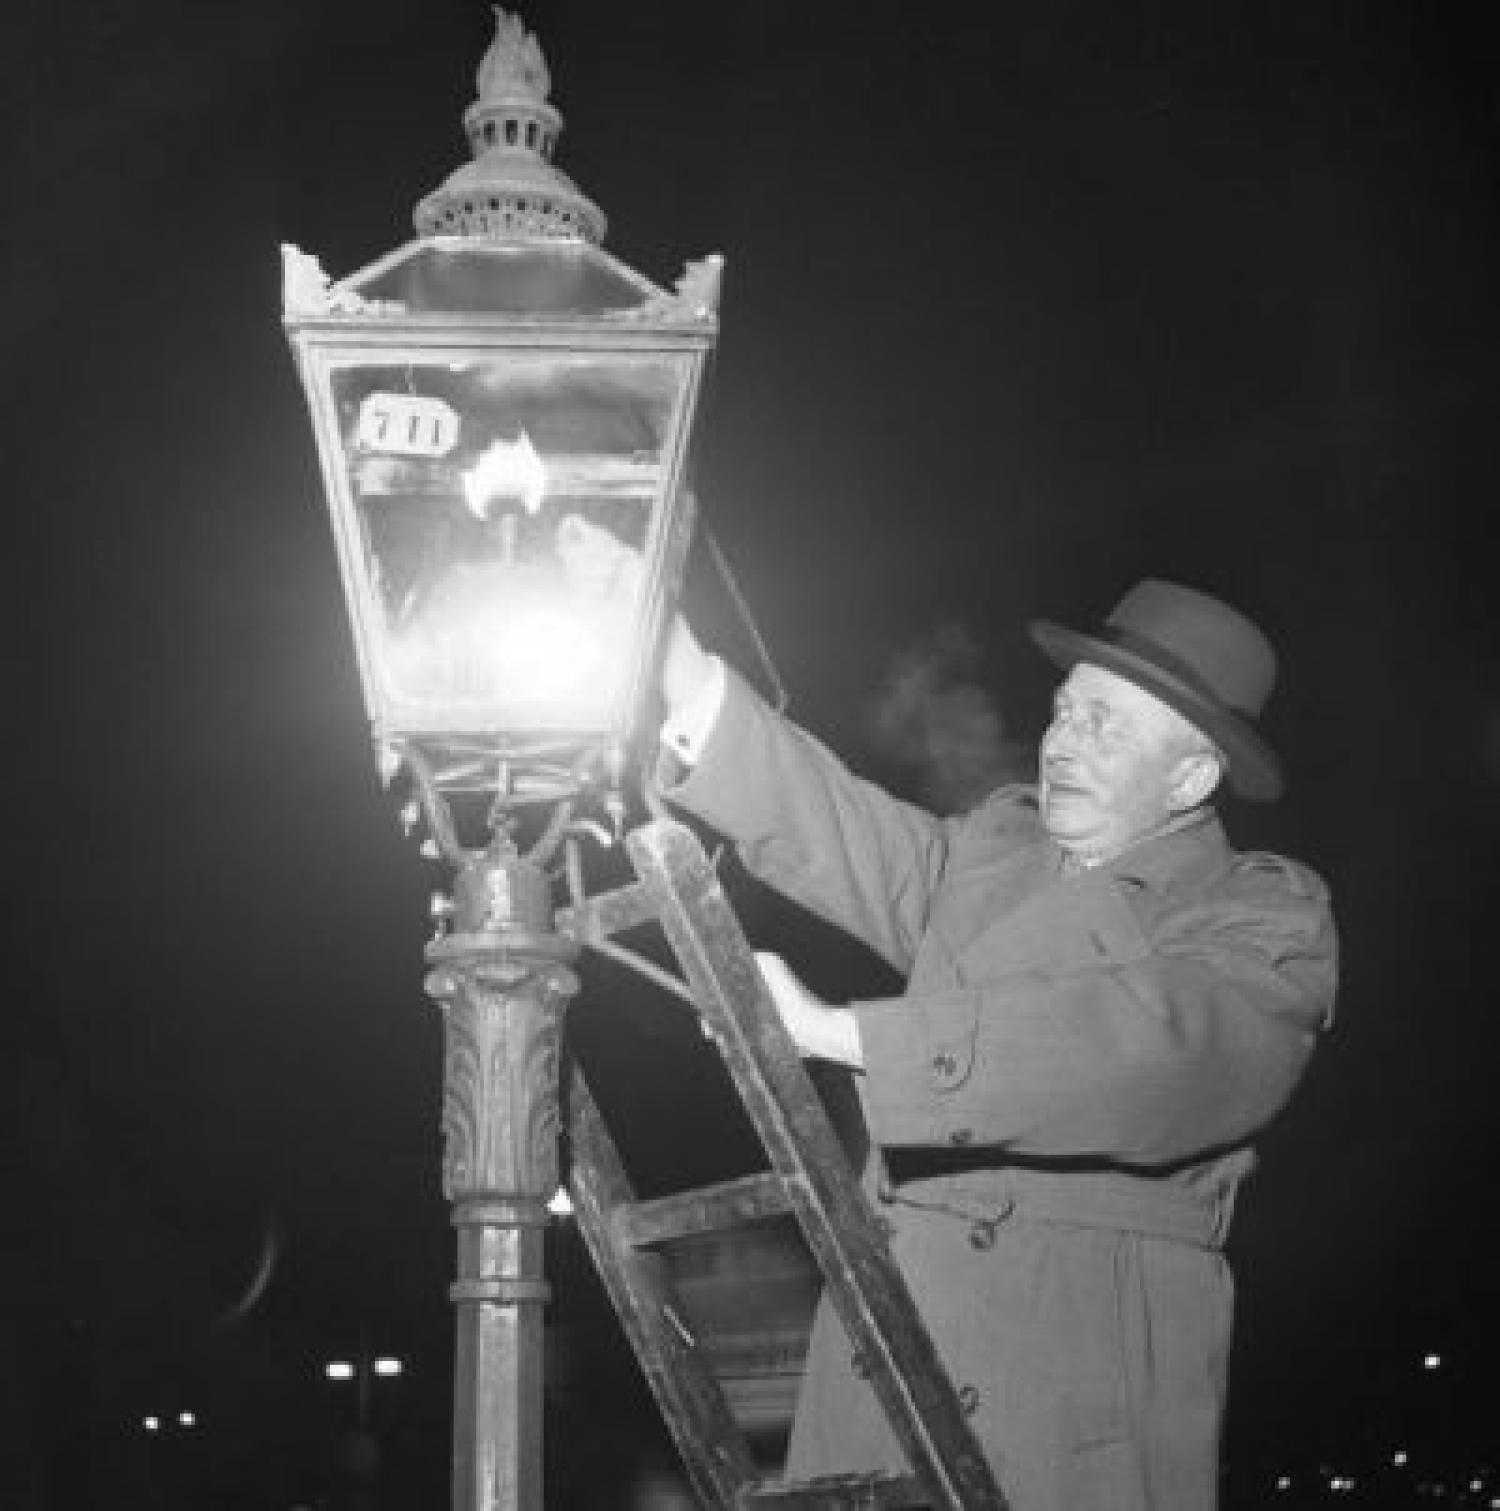 Antique Street Lighting   Childhood Memories   Main Image